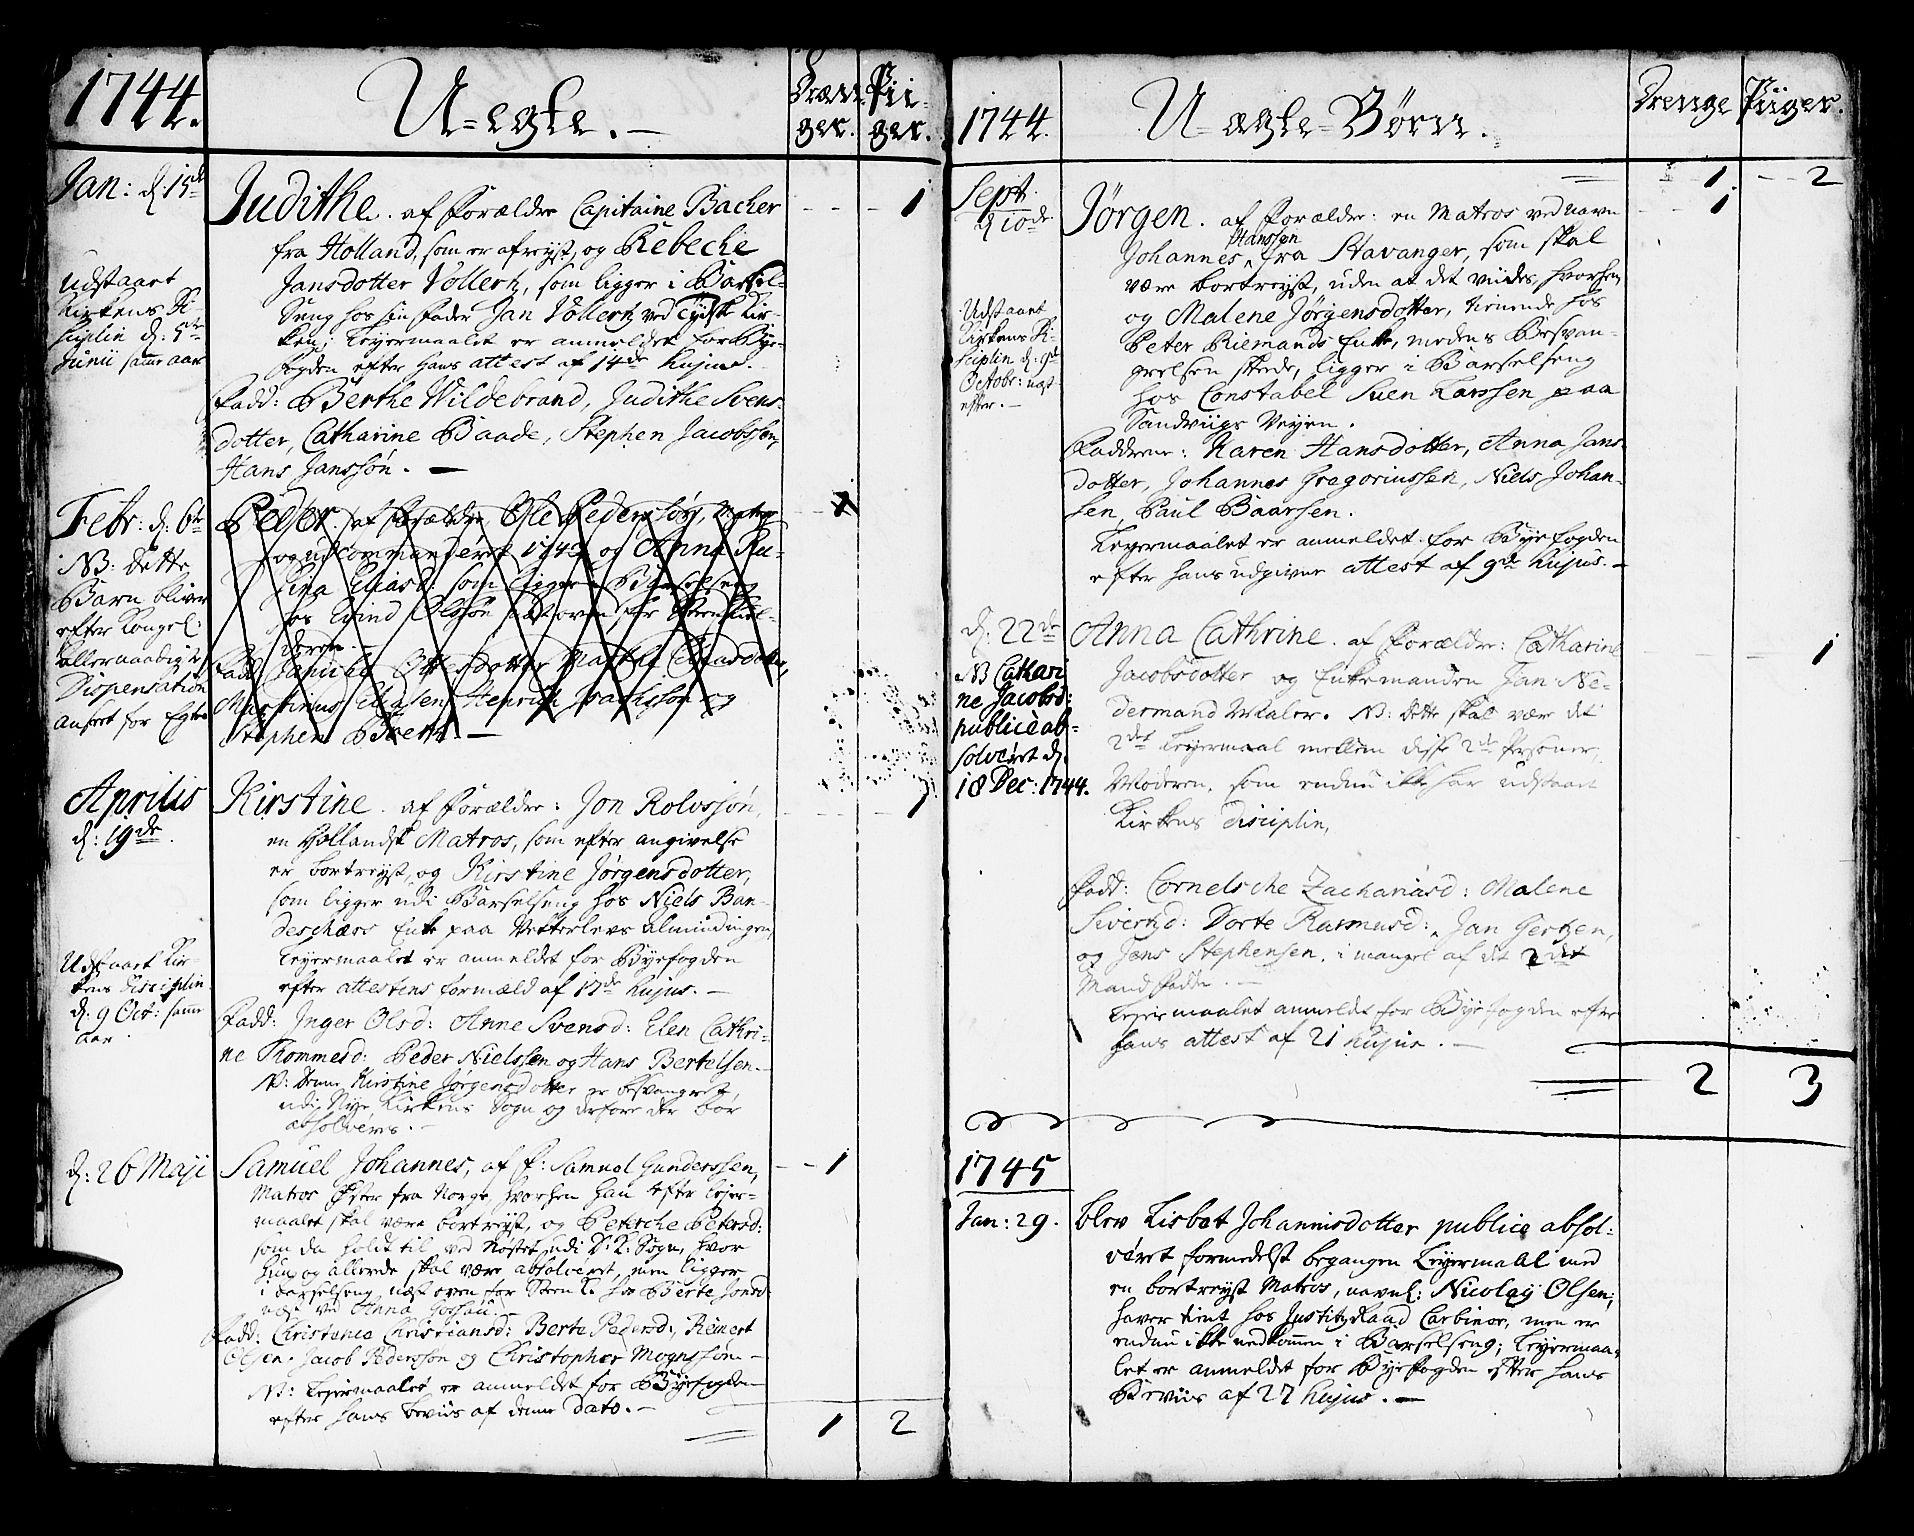 SAB, Korskirken Sokneprestembete, H/Haa/L0004: Ministerialbok nr. A 4, 1720-1750, s. 305